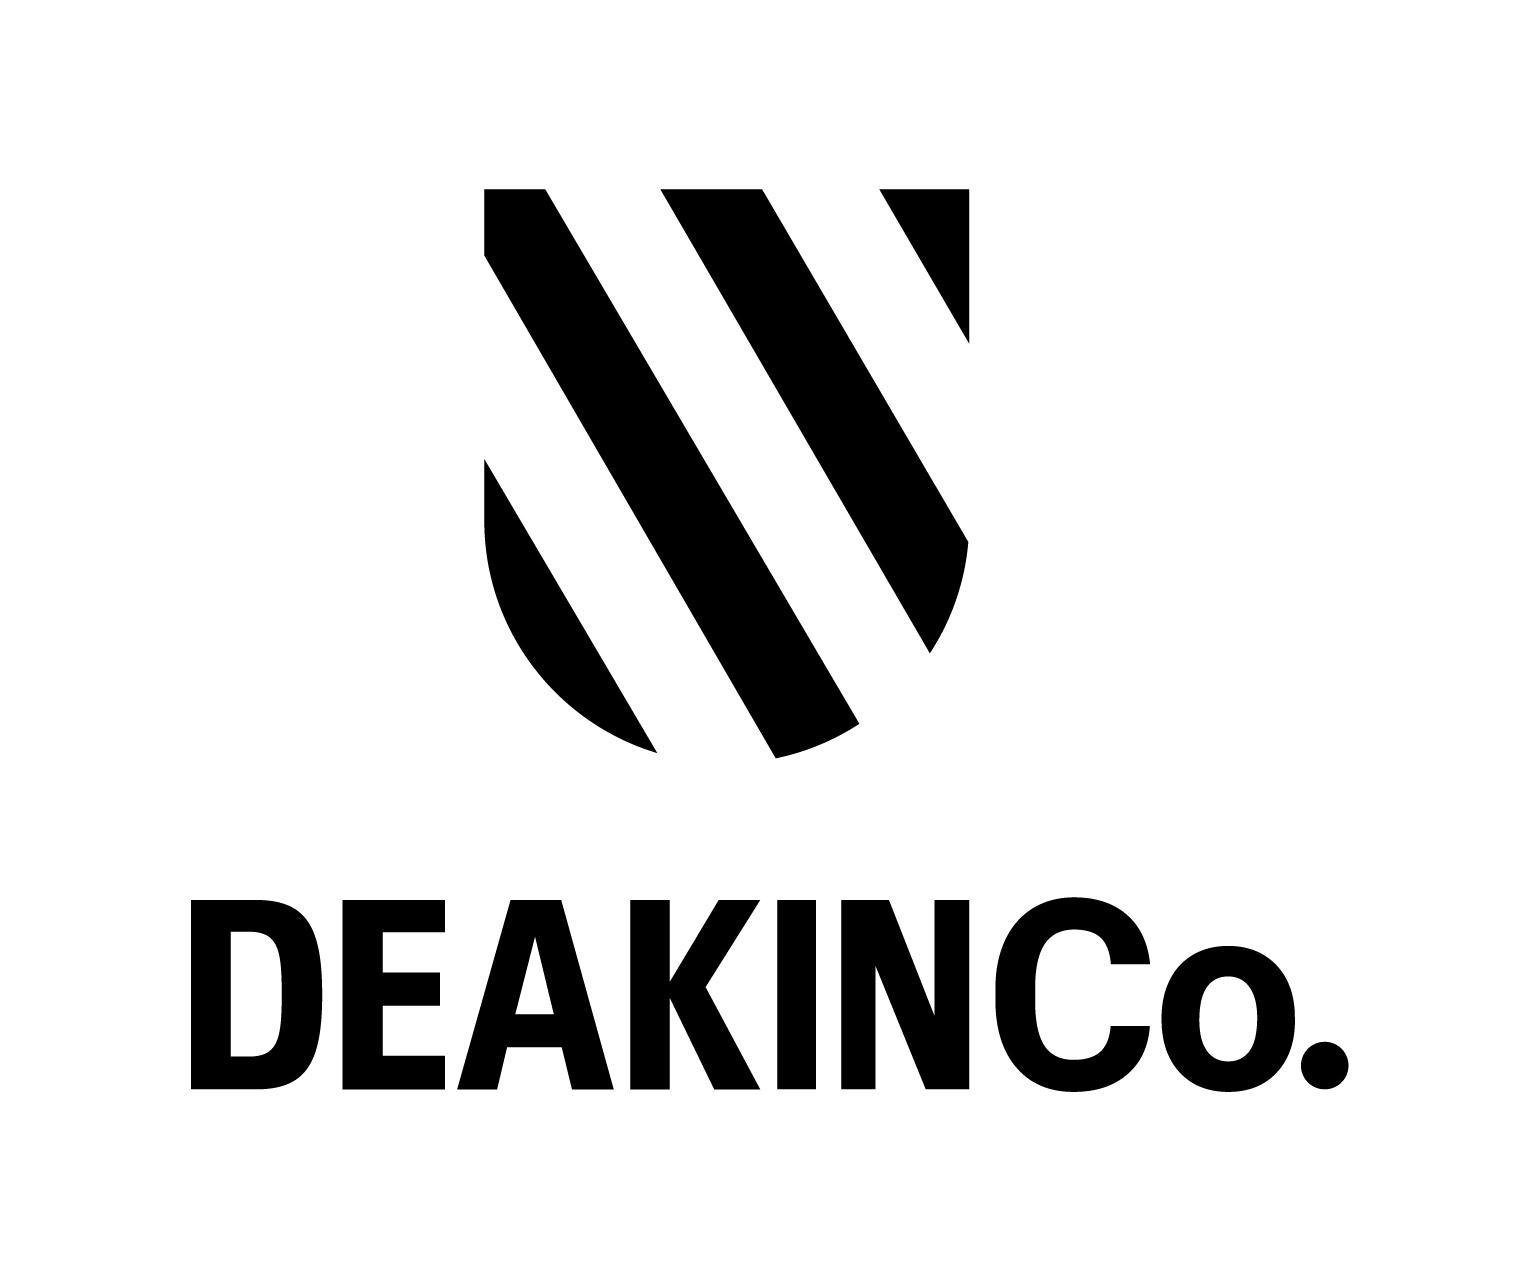 DeakinCo.